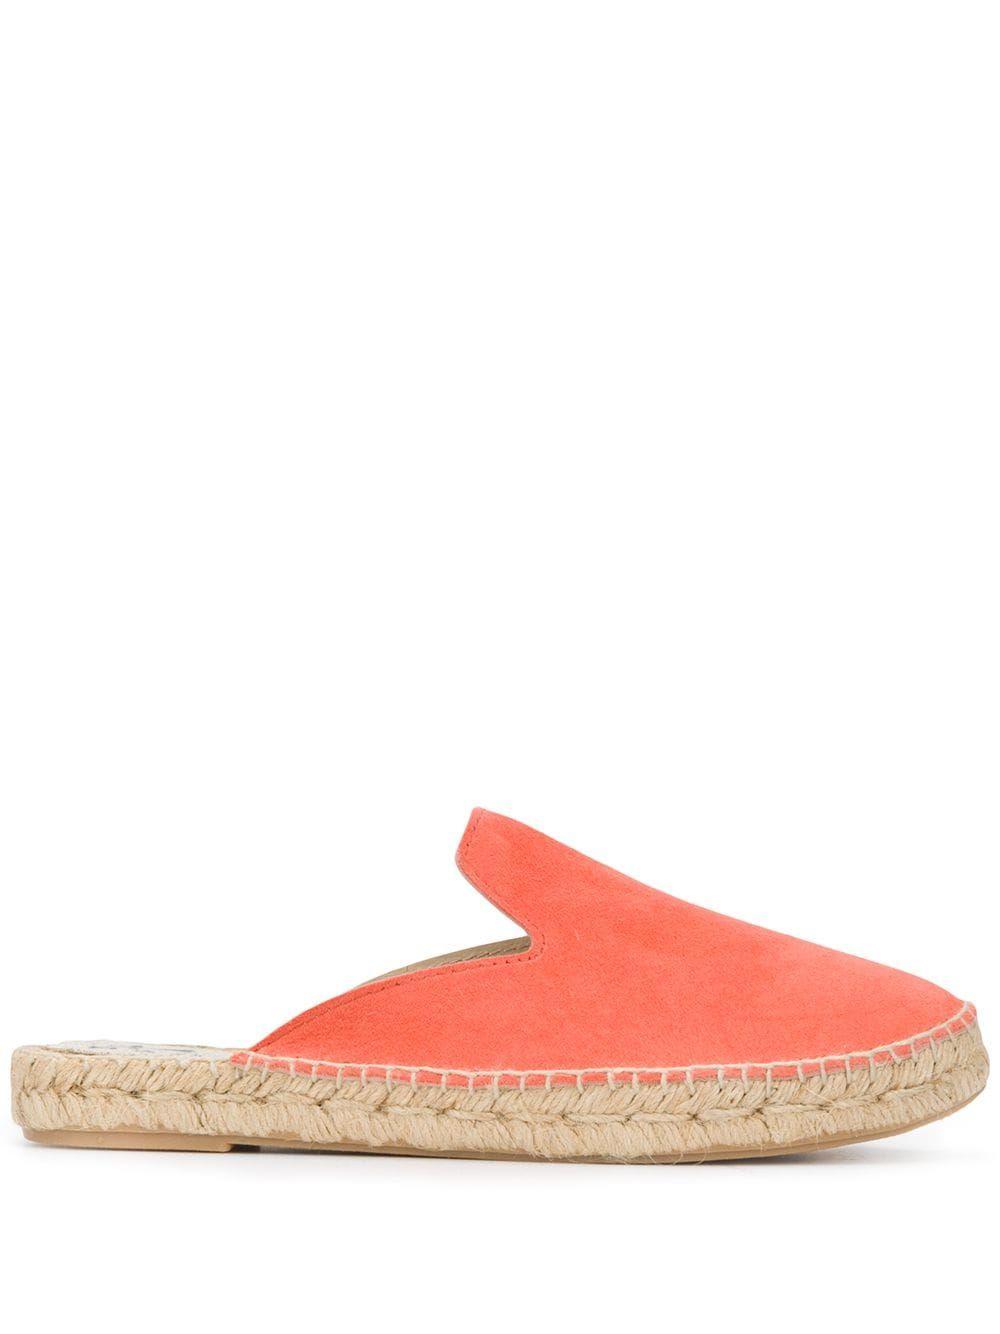 Manebi scarpe basse arancio